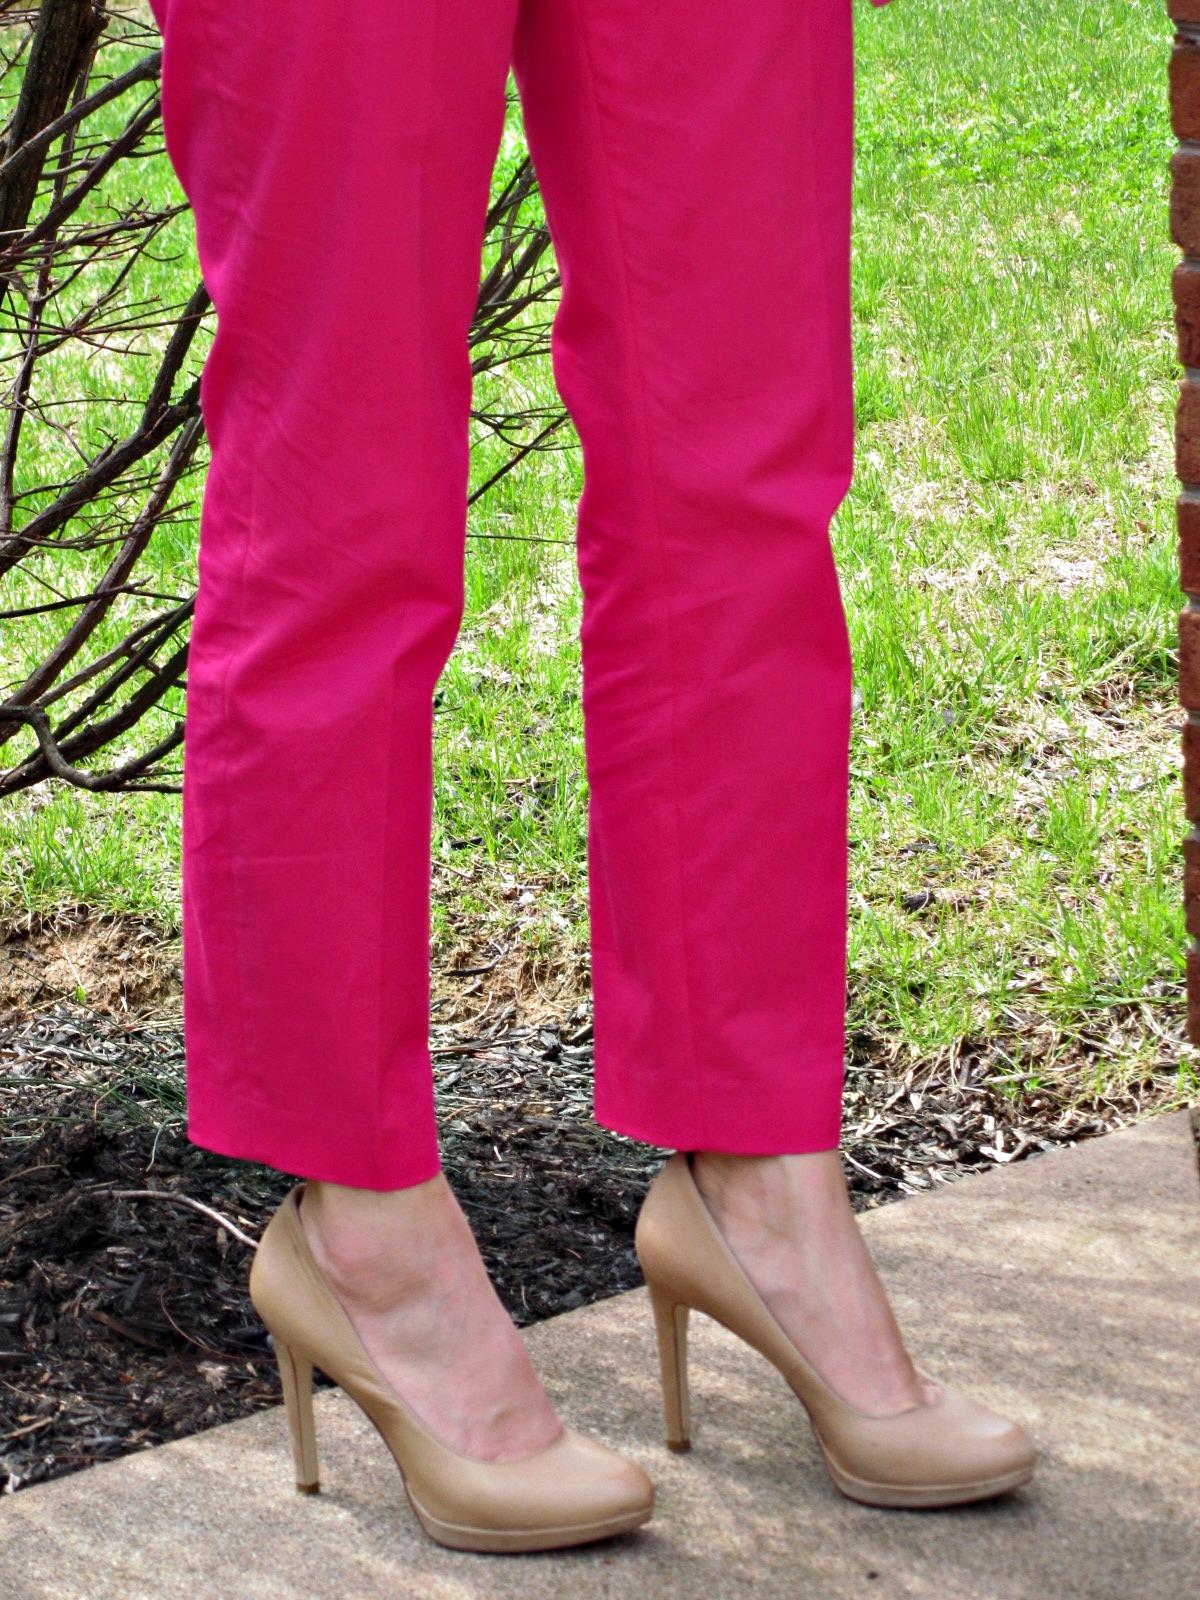 pink J.Crew cafe capri pant, BCBG nude heels